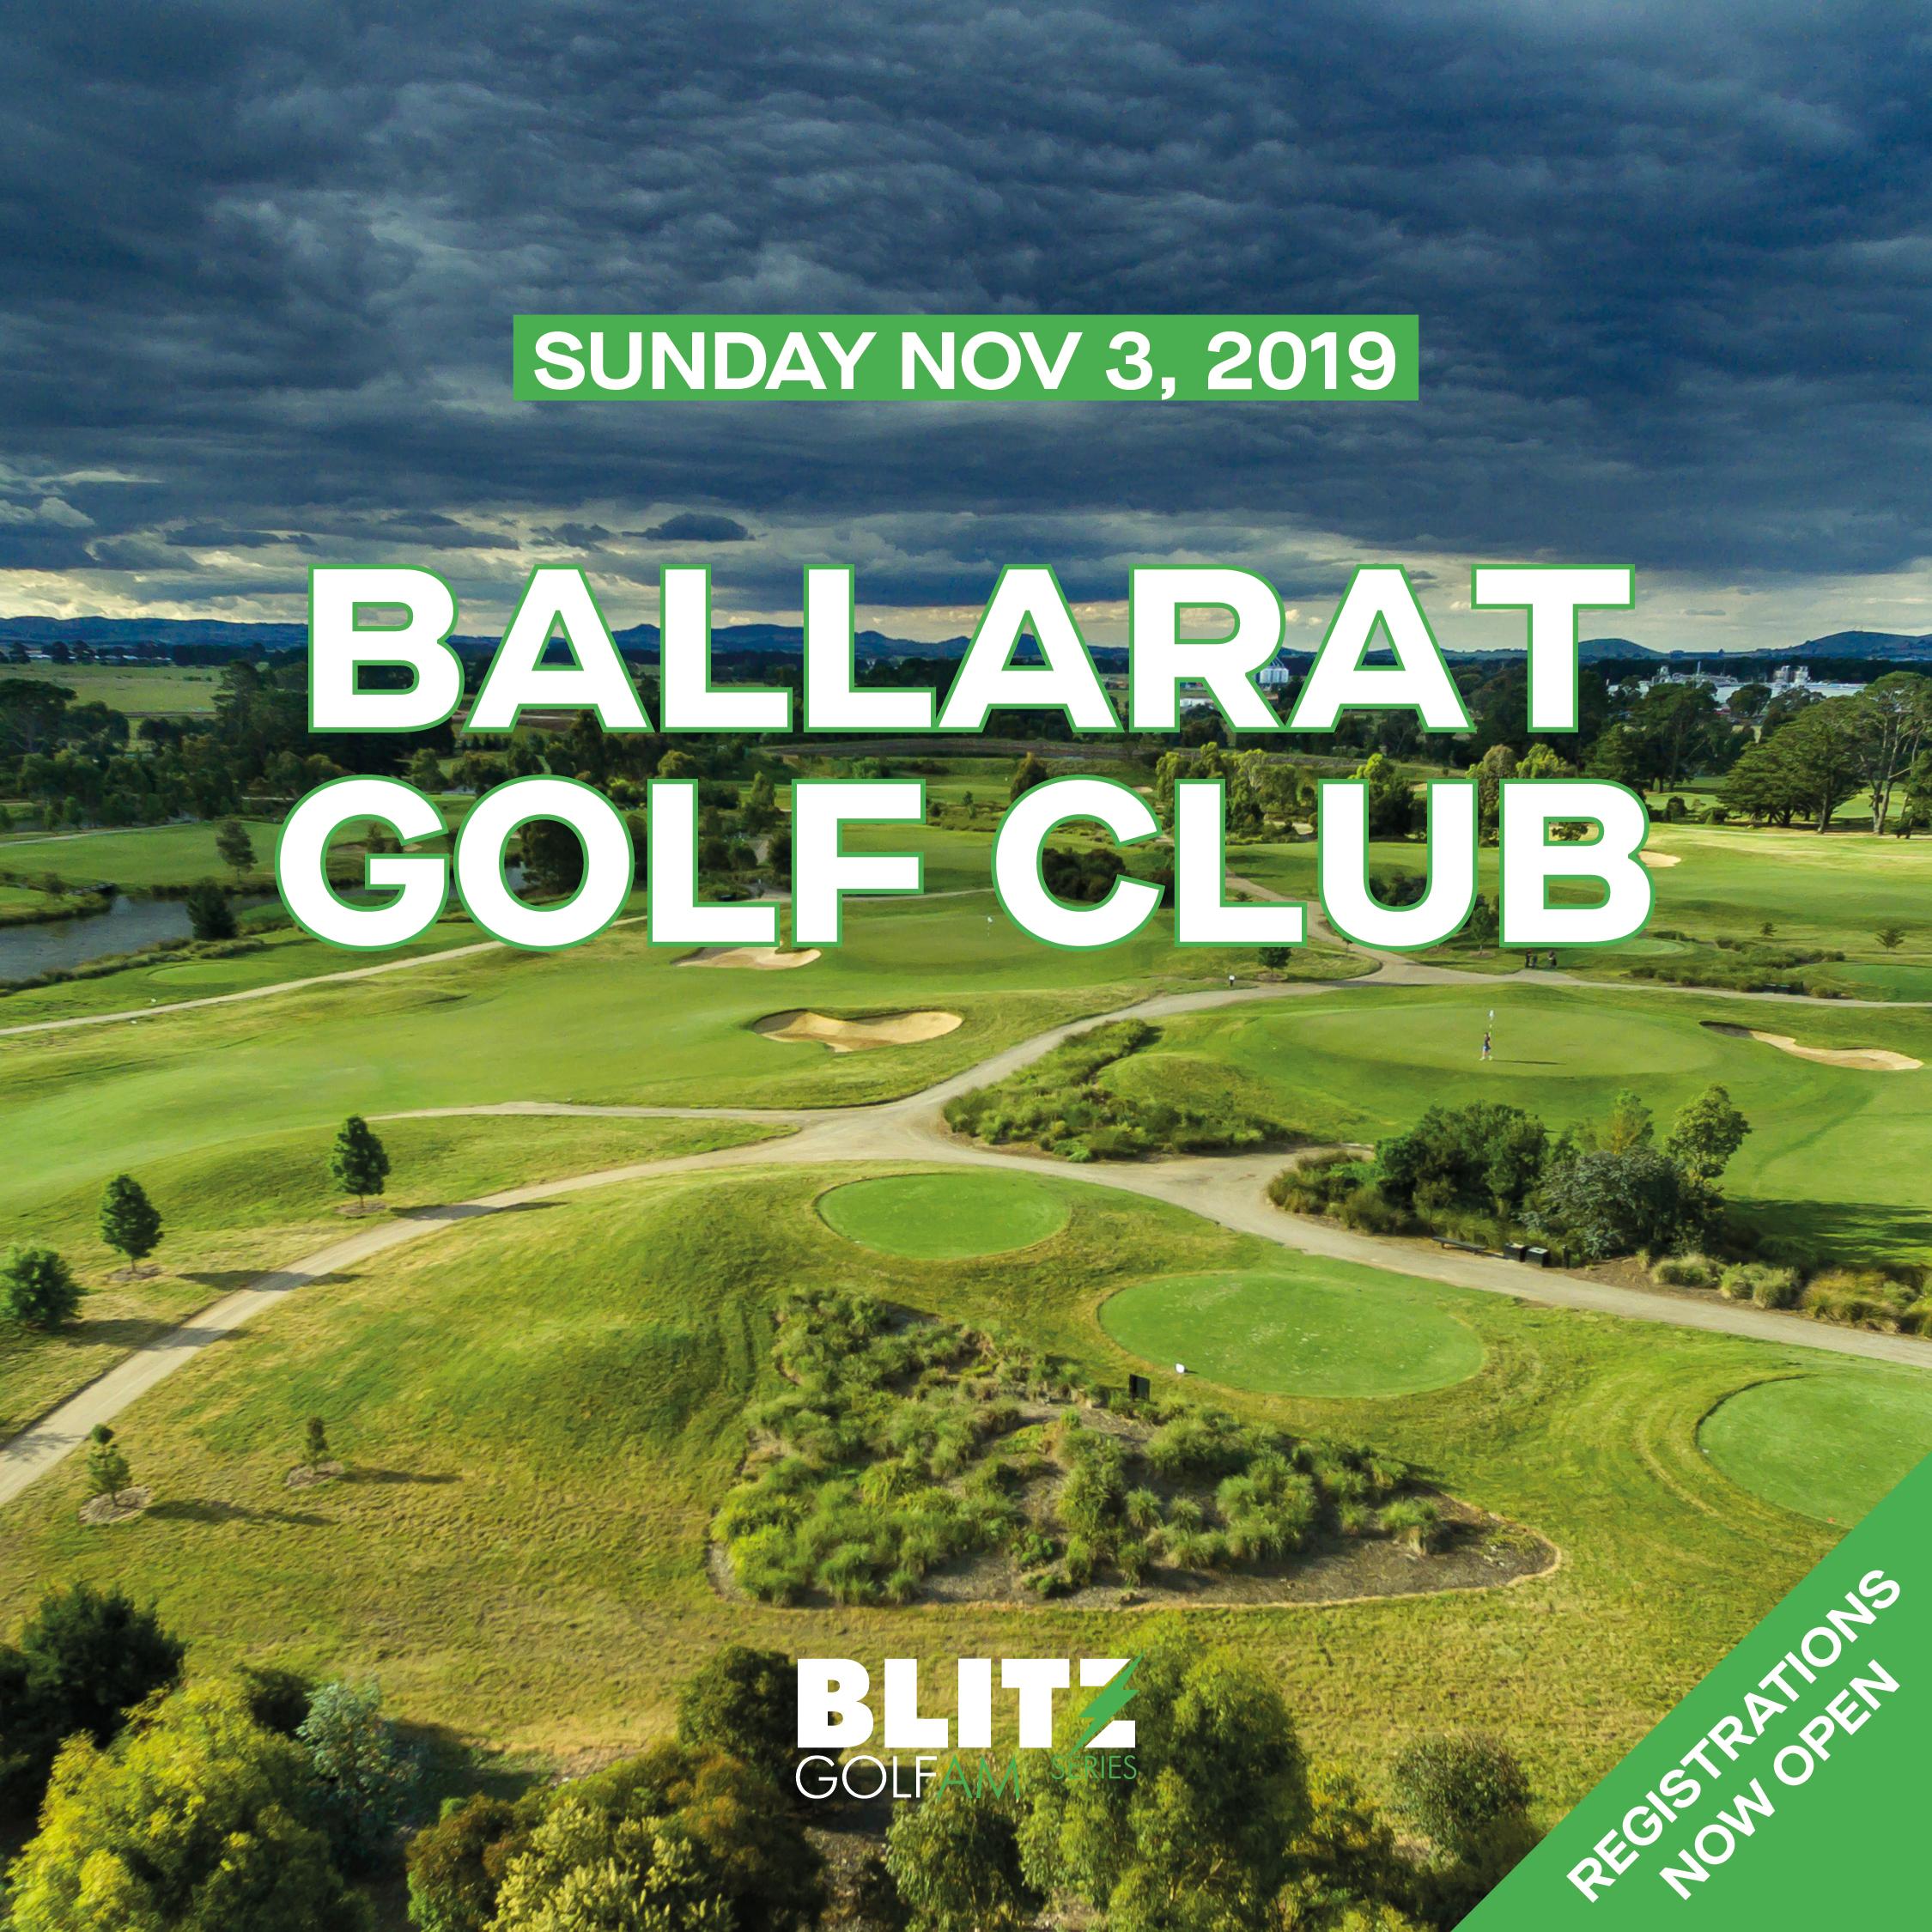 VICTAS_Ballarat_Blitz 2020_AM Series Launch_031119.jpg